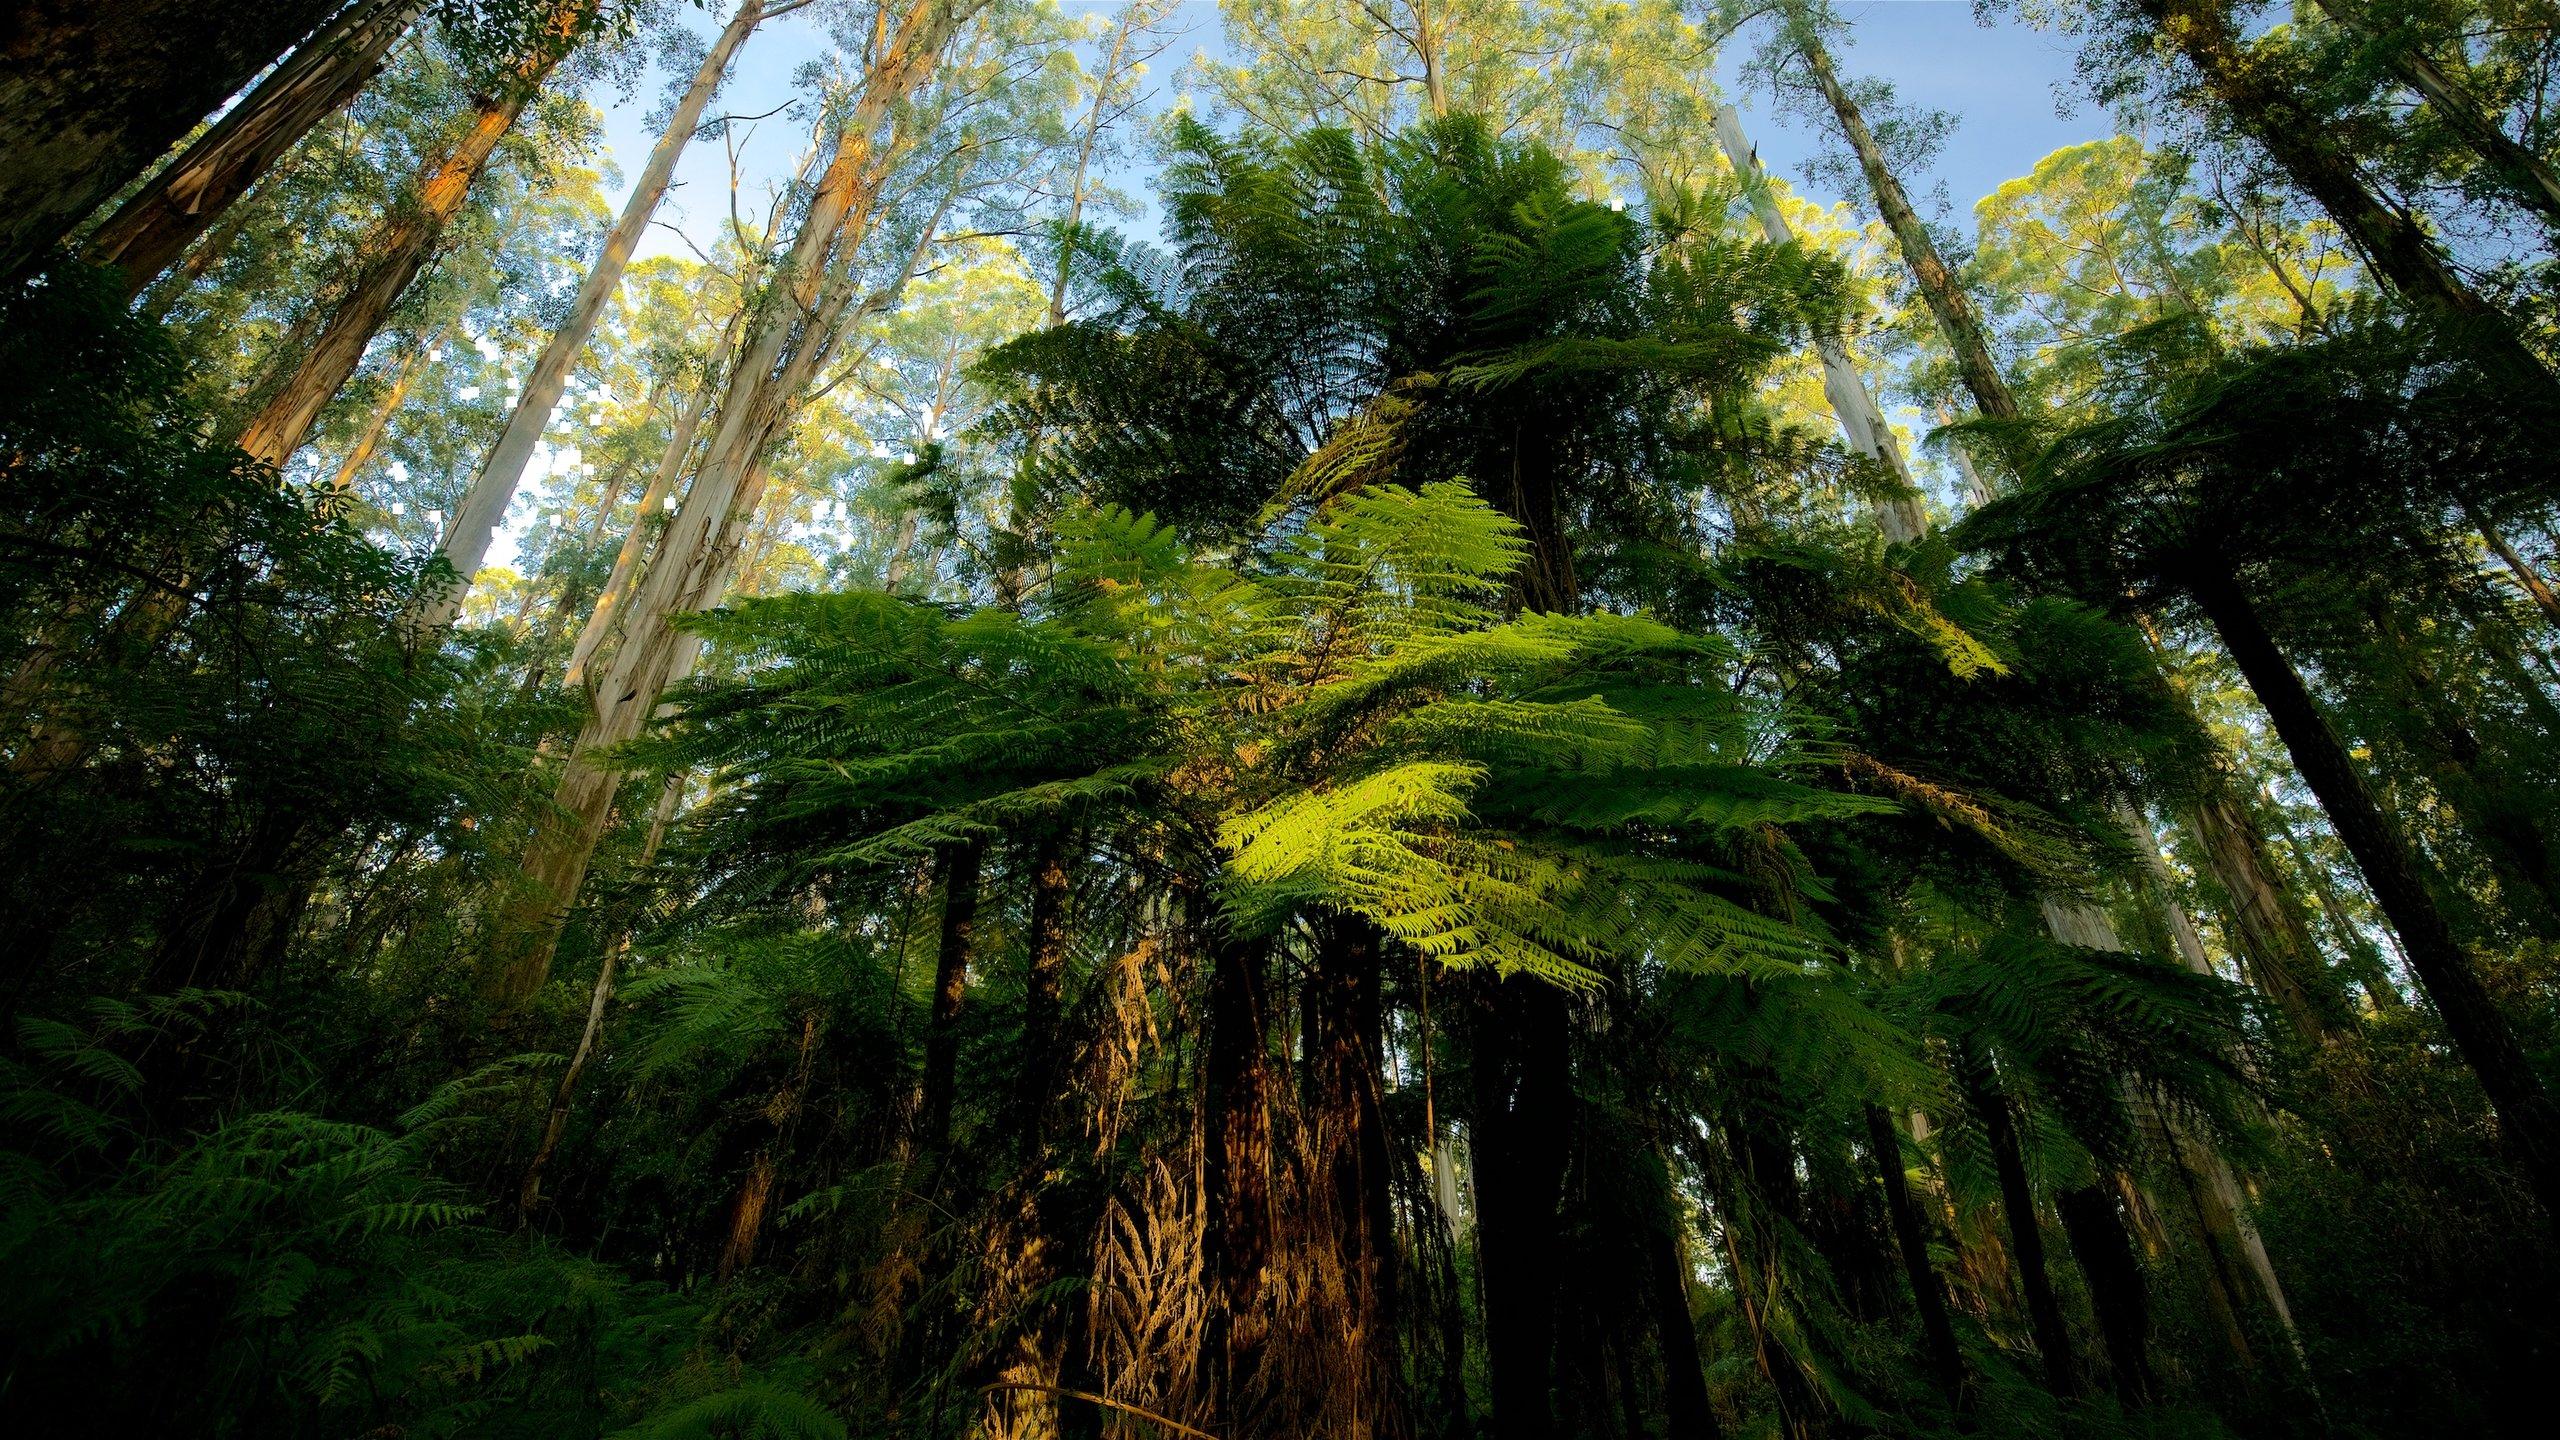 Dandenong Ranges, Melbourne, Victoria, Australia